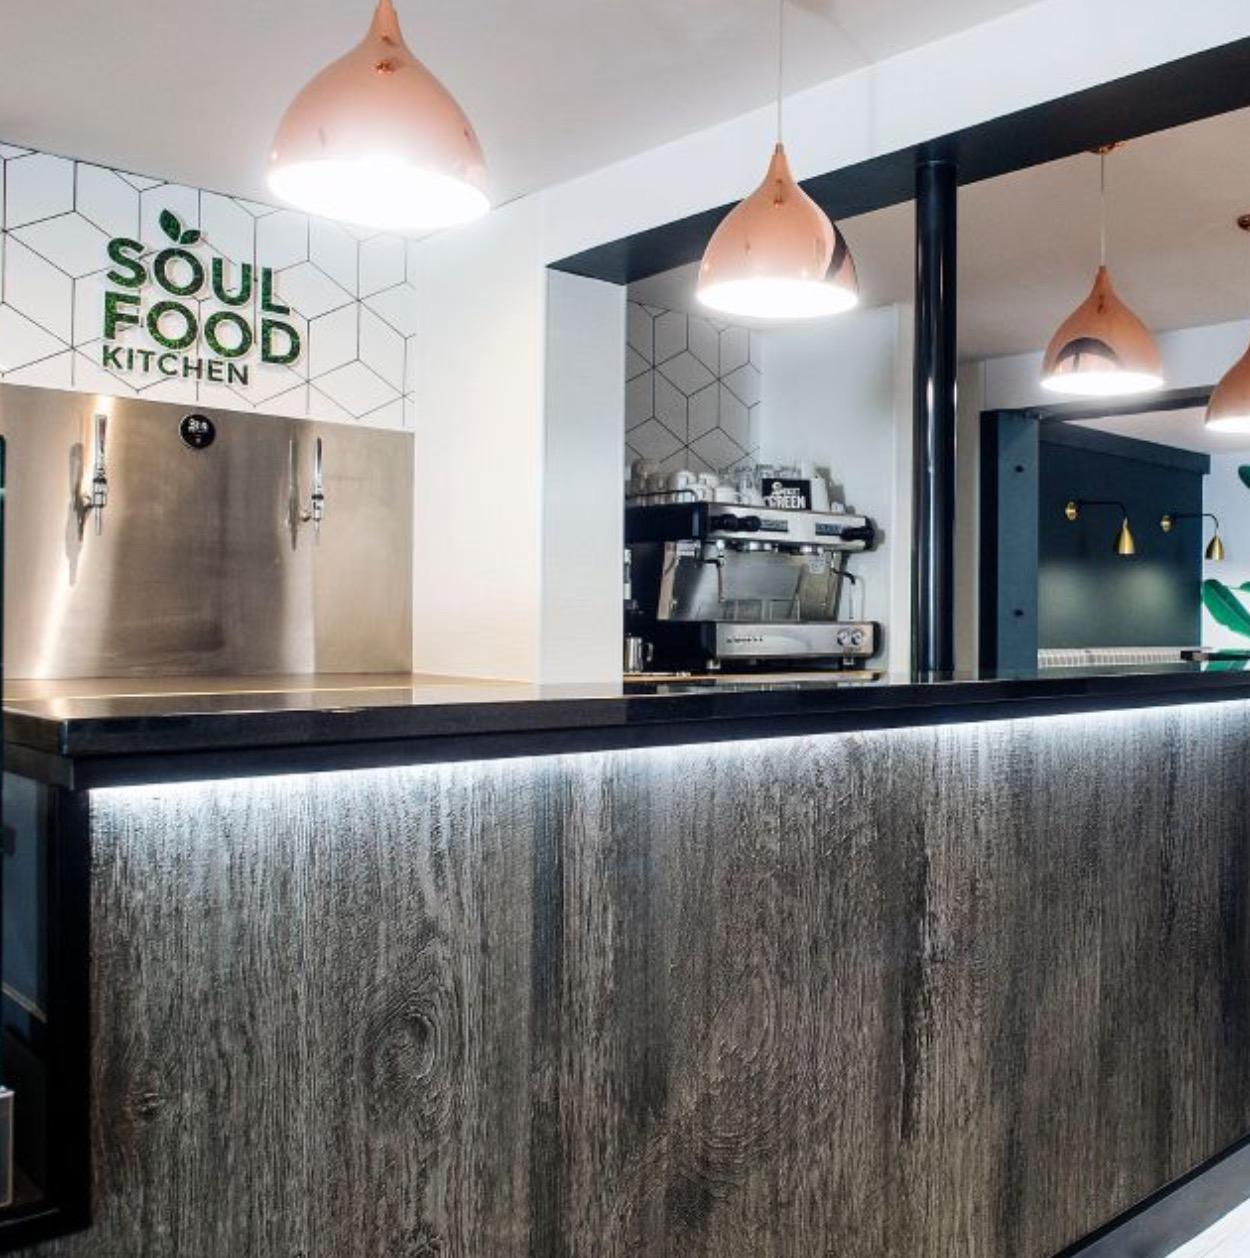 restaurant-table-tops-soul-food-kitchen.jpg